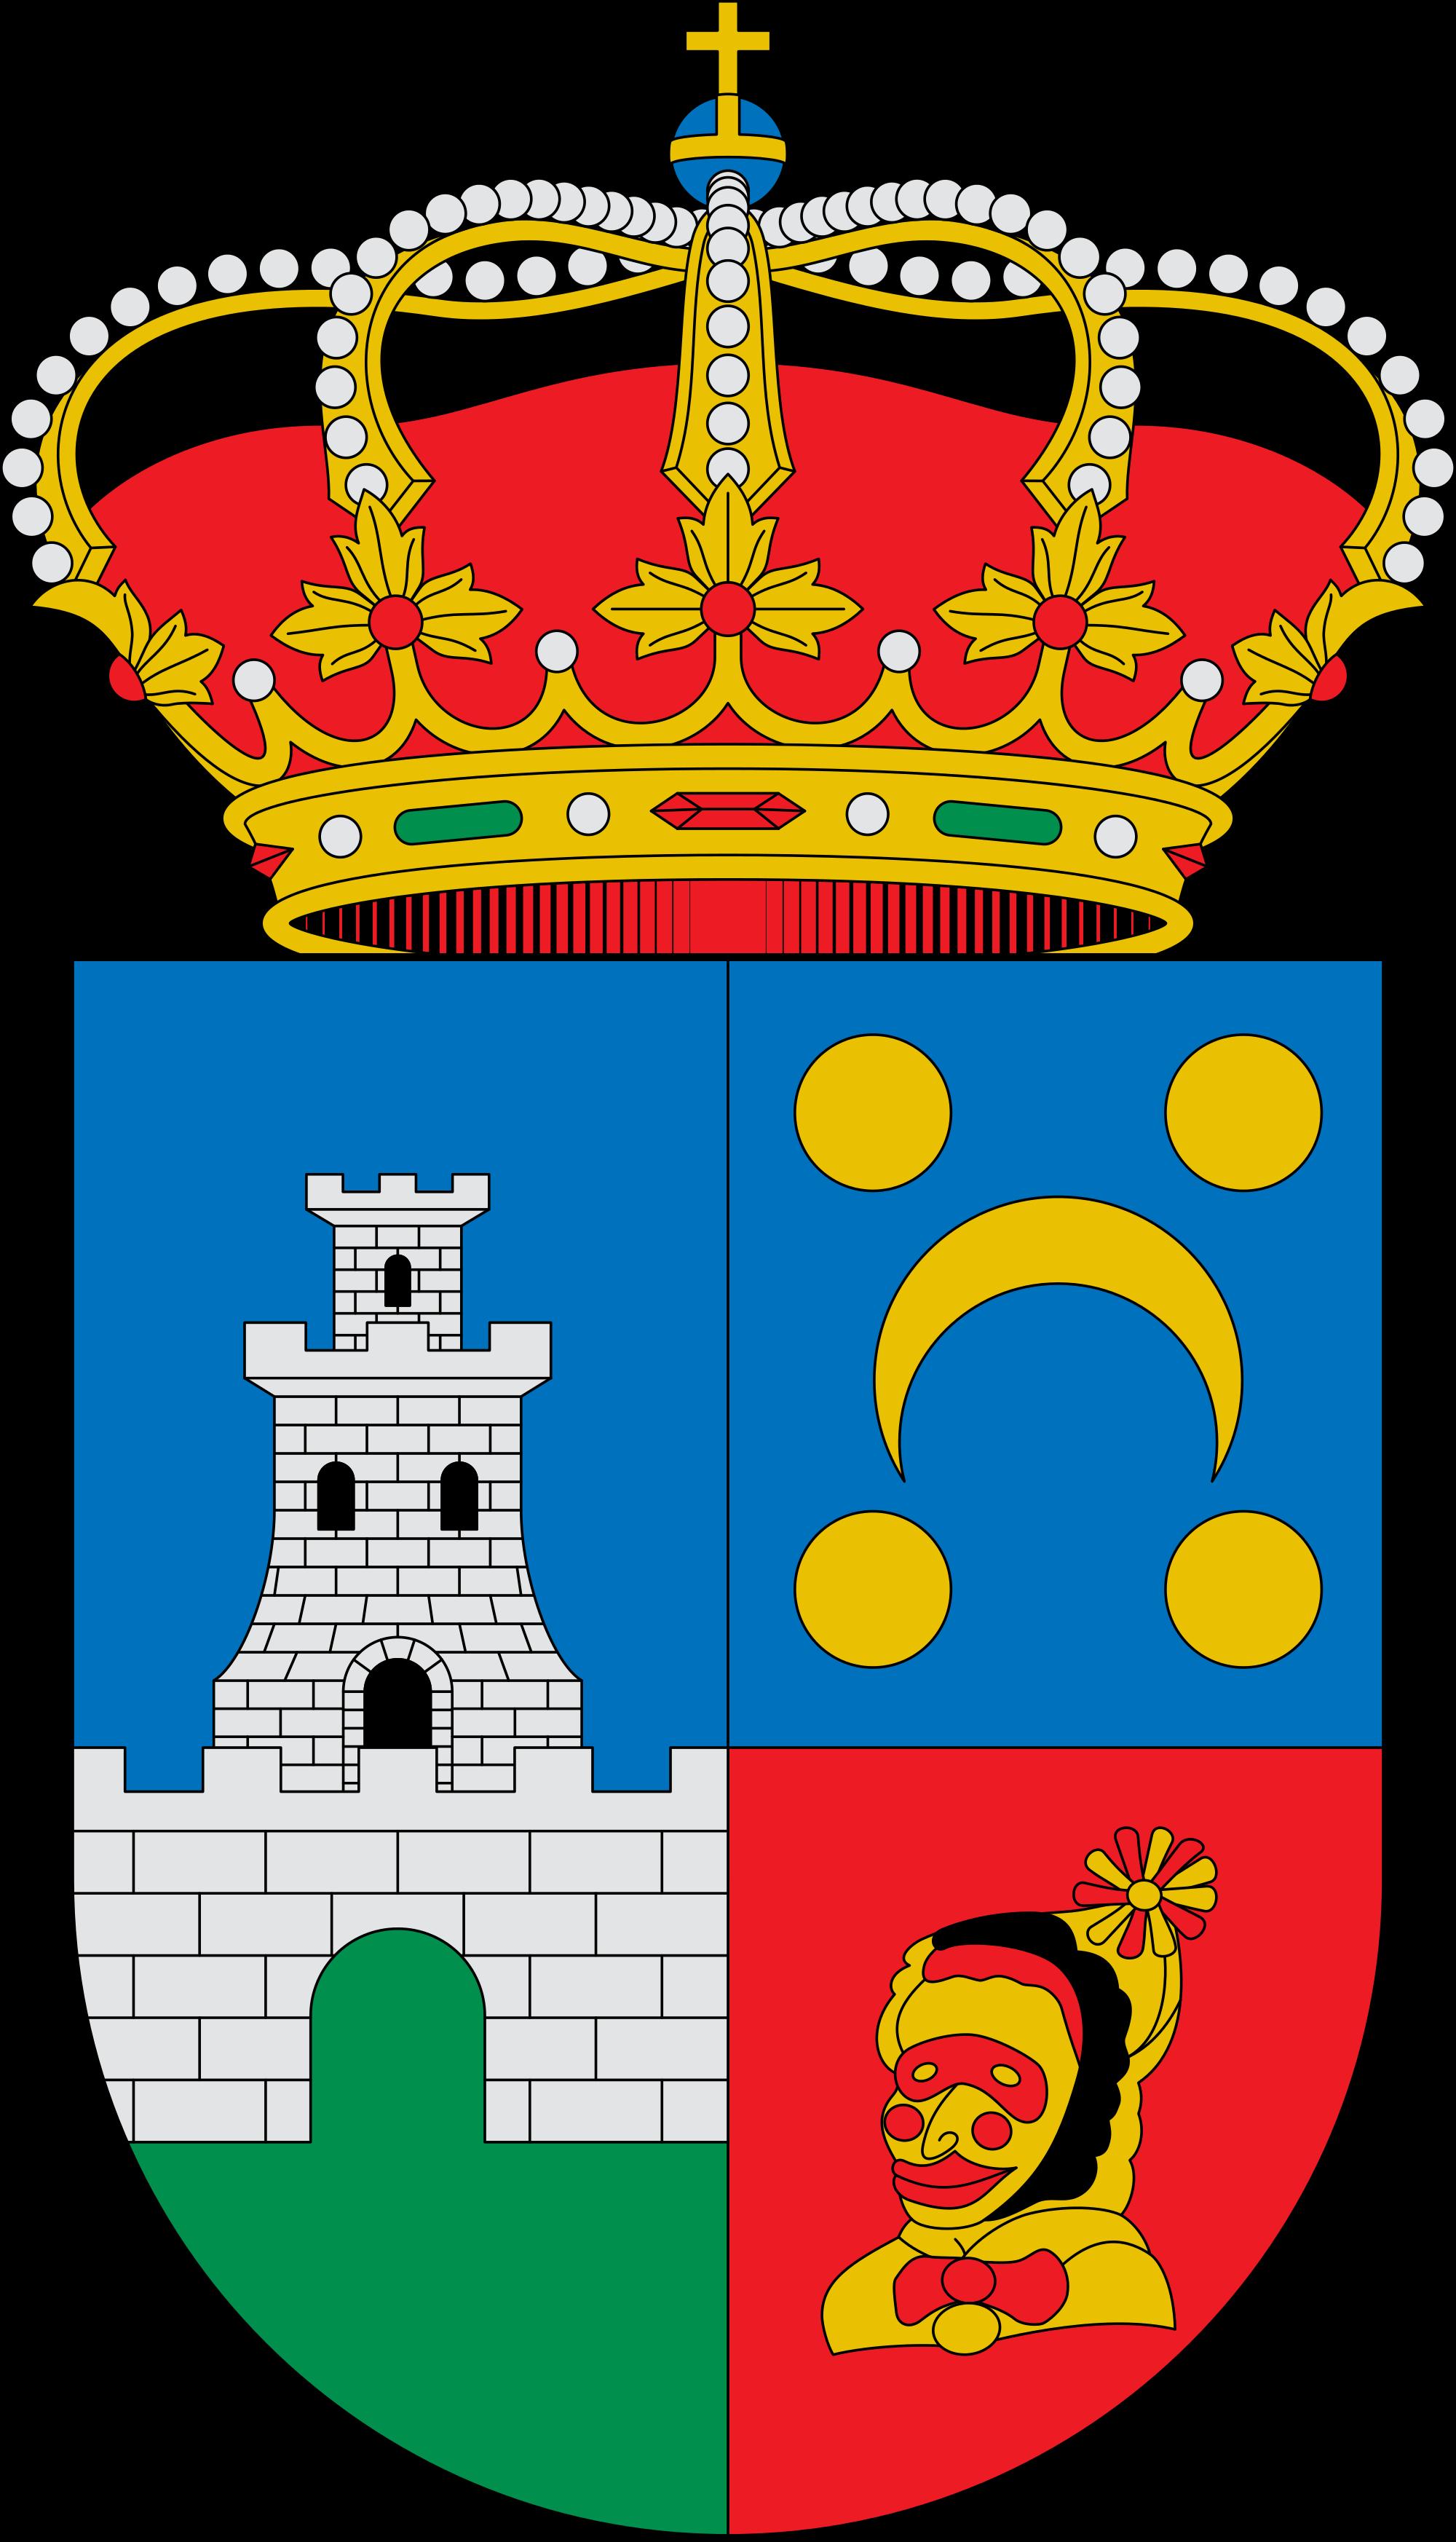 File:Escudo de Castrillo de Murcia (Burgos).svg.